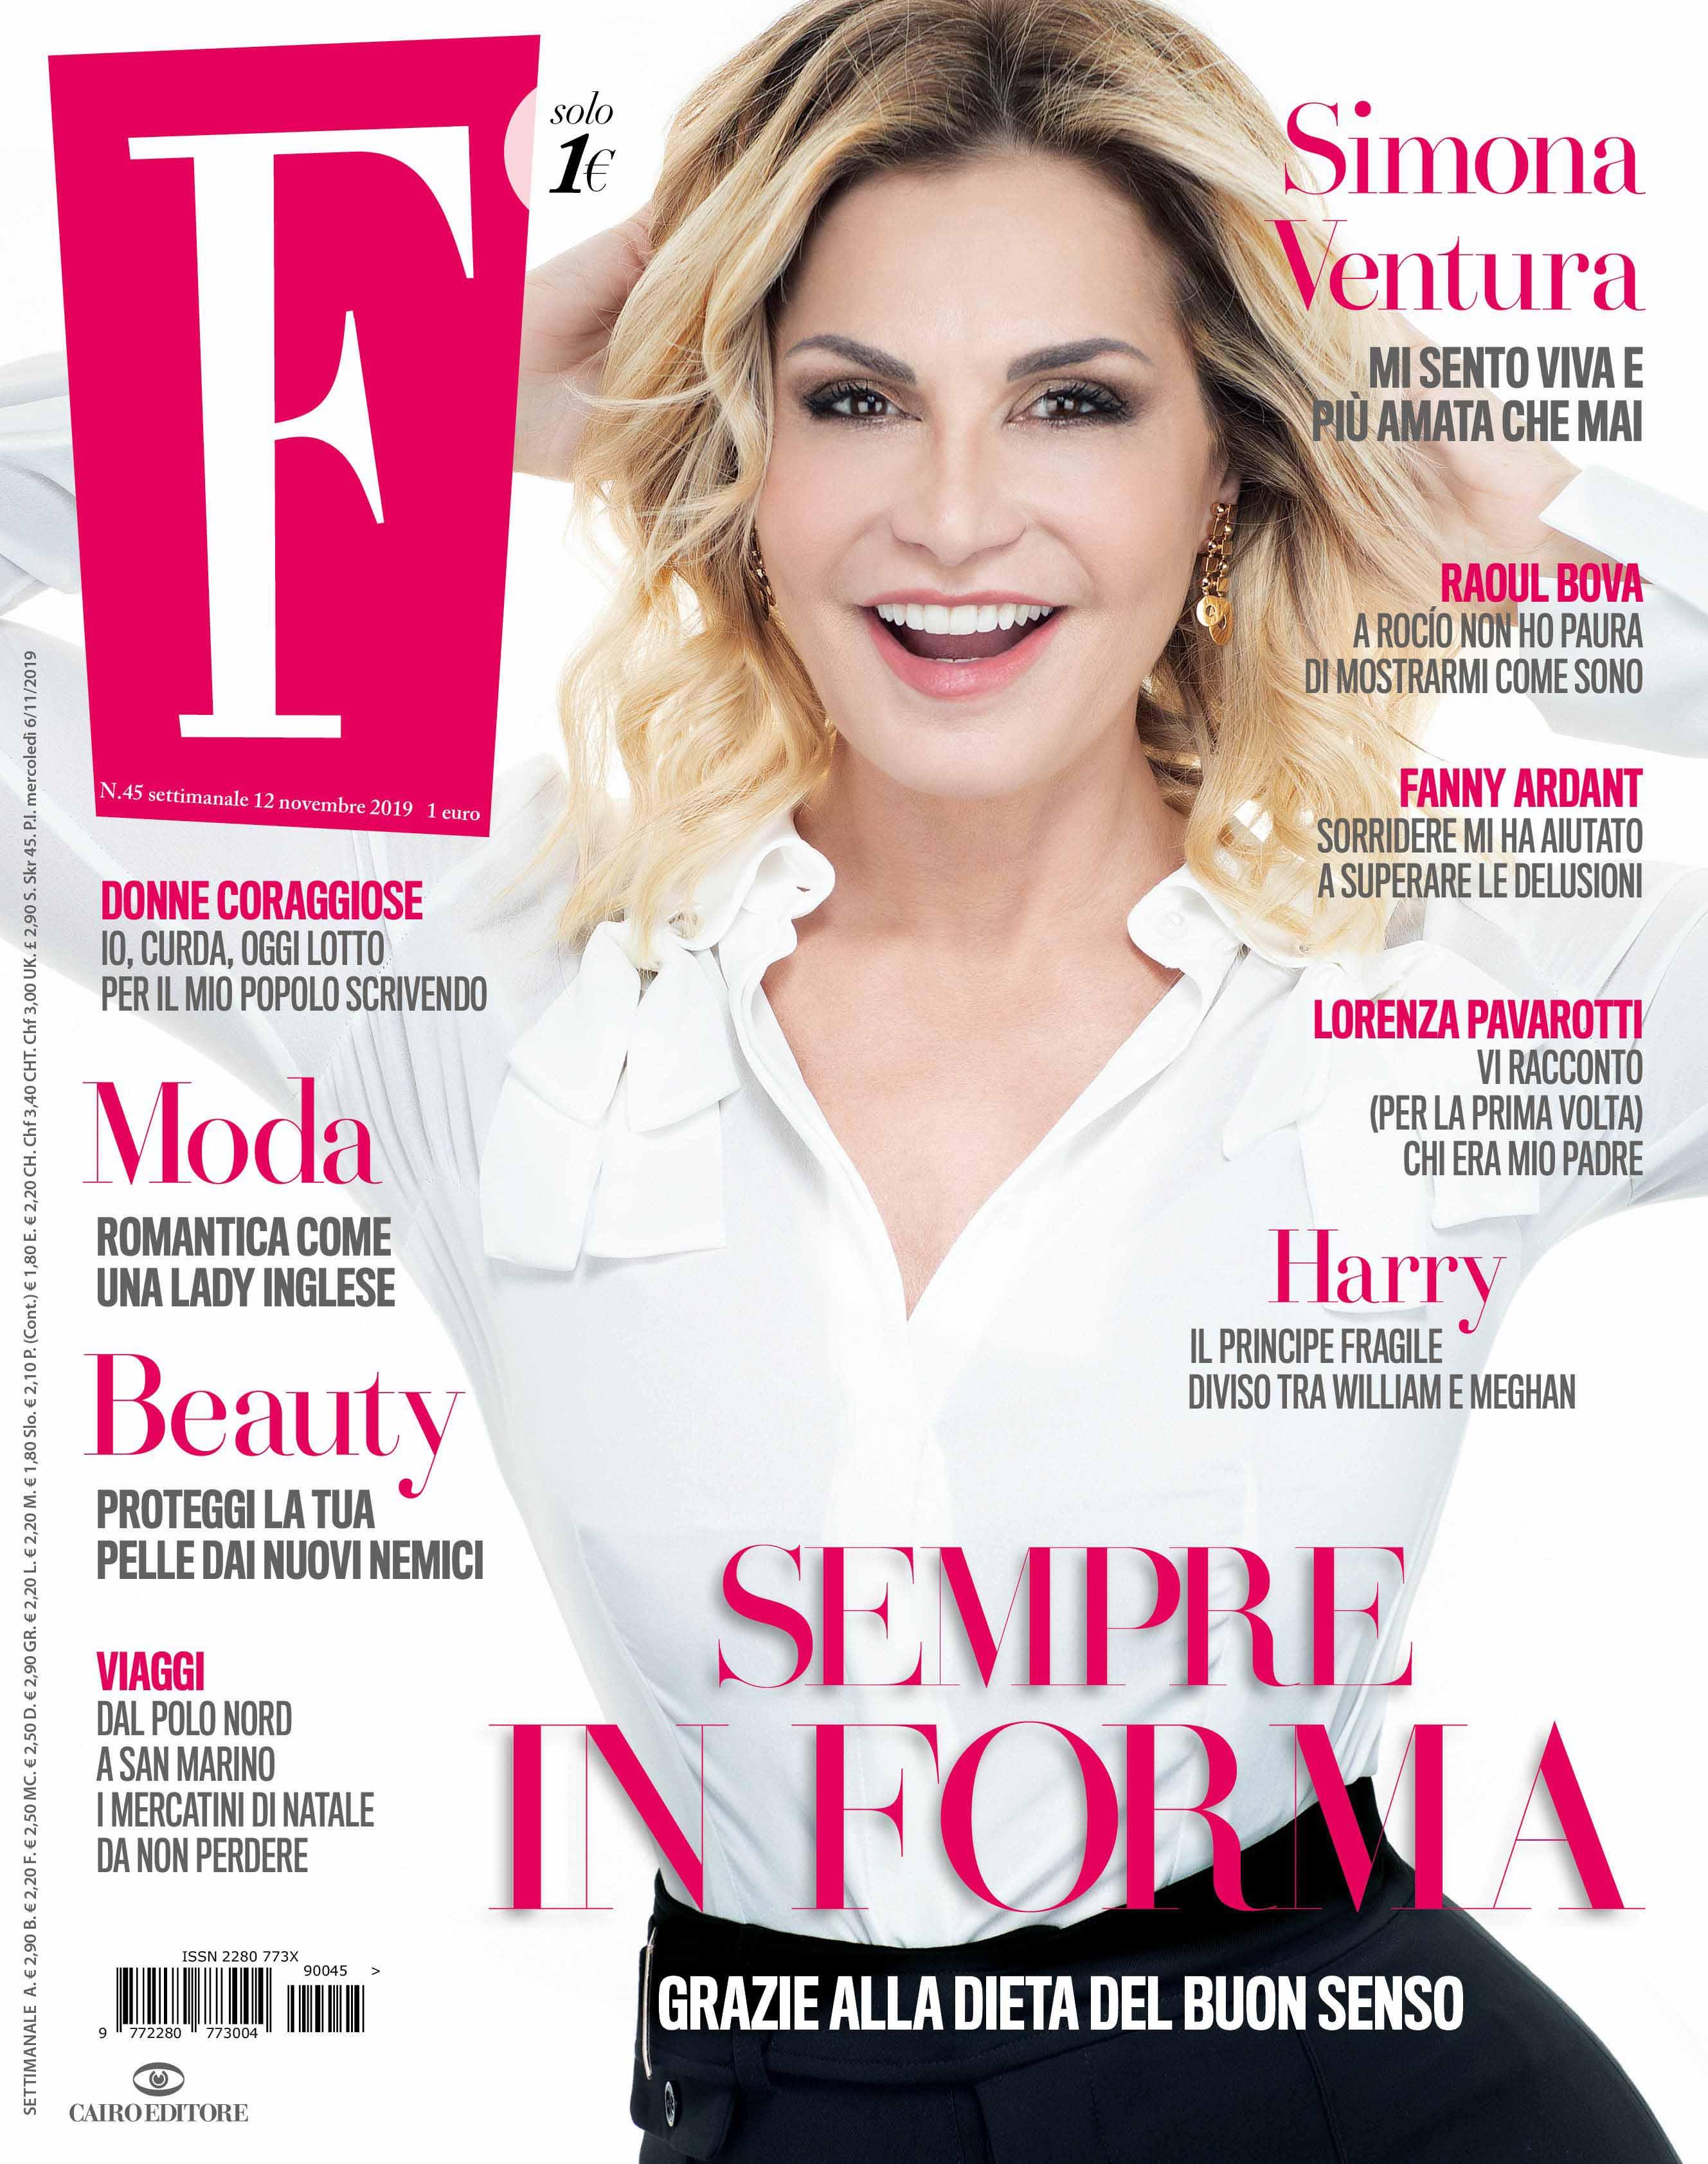 Simona Ventura F